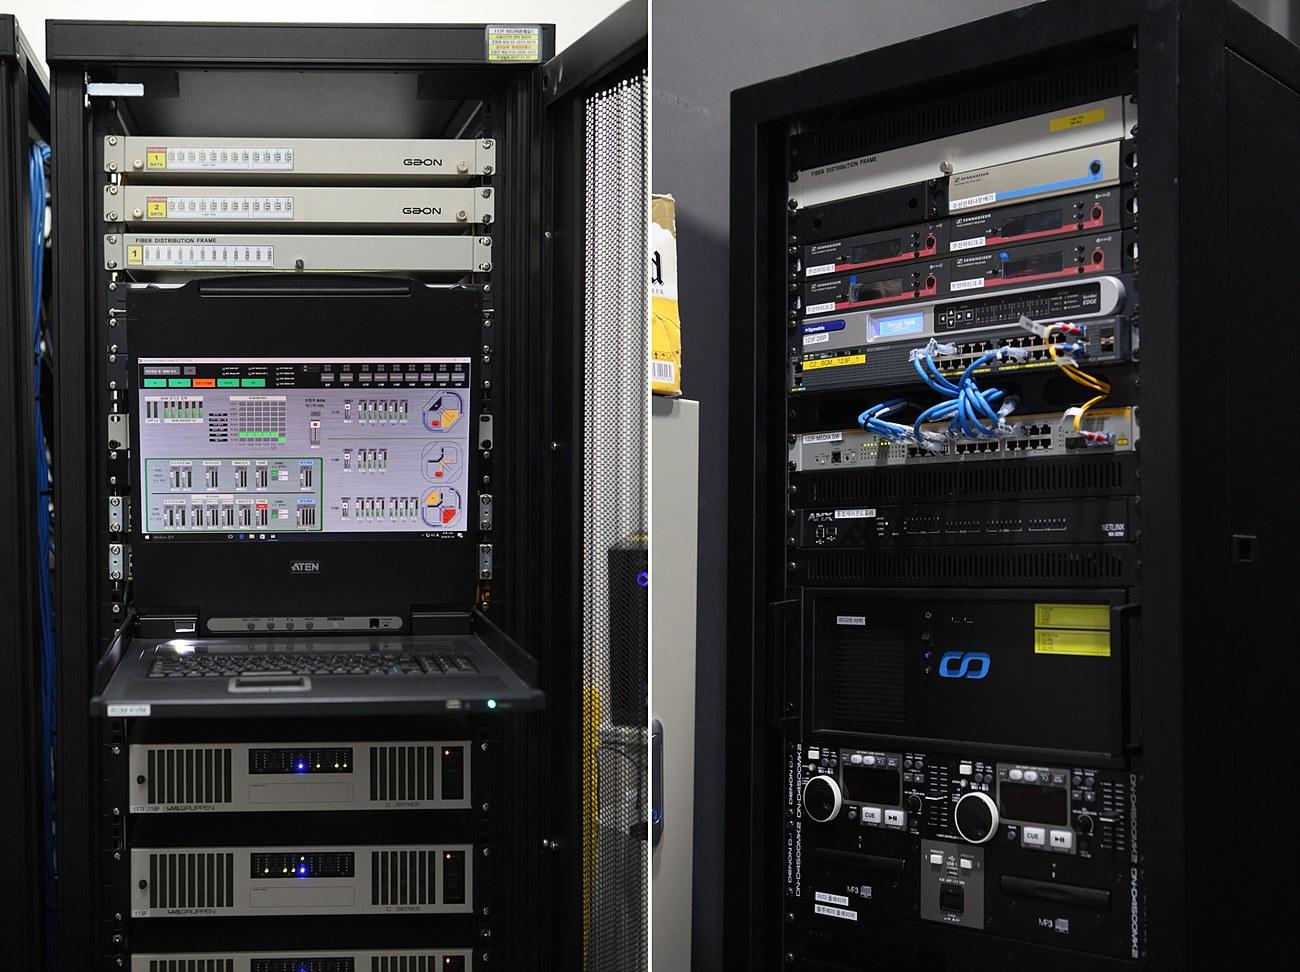 Symetrix 컨트롤을 GUI를 제공하는 KVM 컨트롤러로 미디어 송출을 모니터링하고 제어한다(좌측), 123층에 마련된 별도의 음향 시스템으로 Symetrix가 역시 시스템을 제어한다(우측)